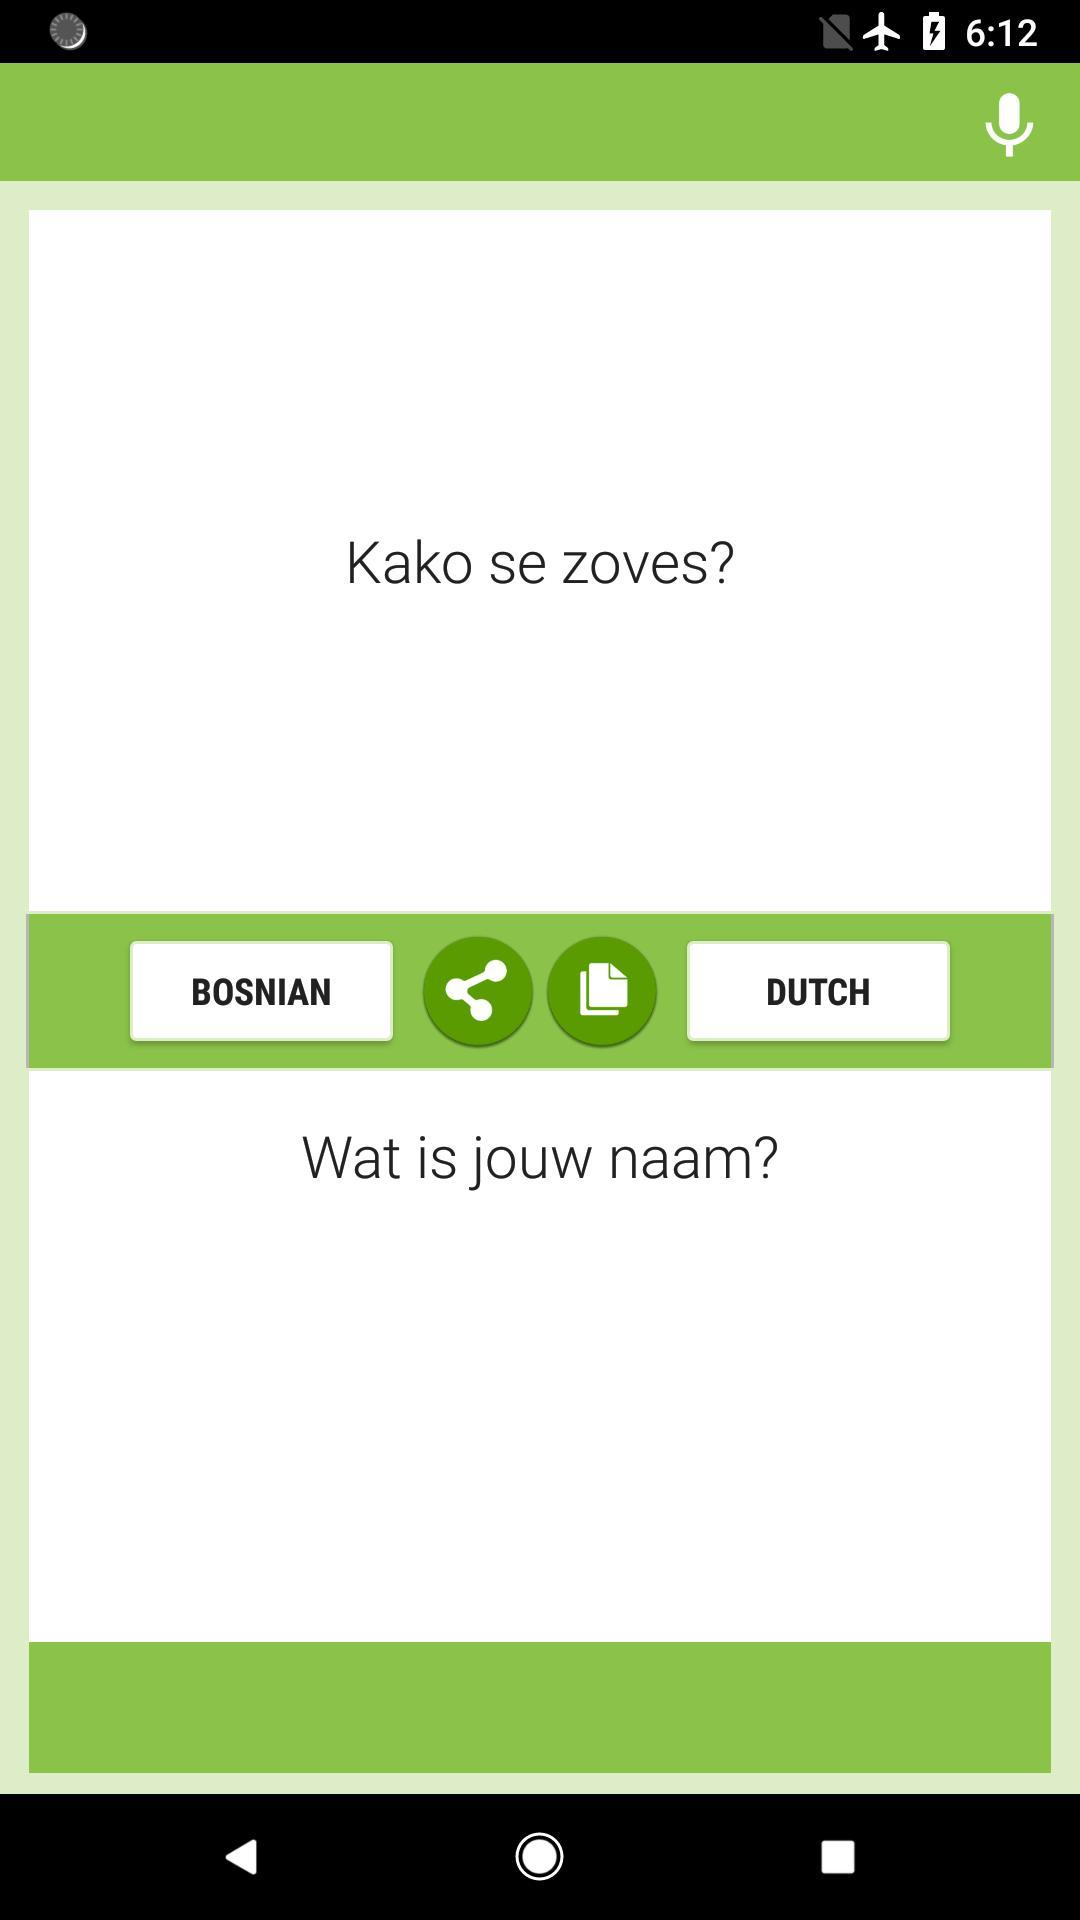 Bosanski Holandski Prevodilac For Android Apk Download